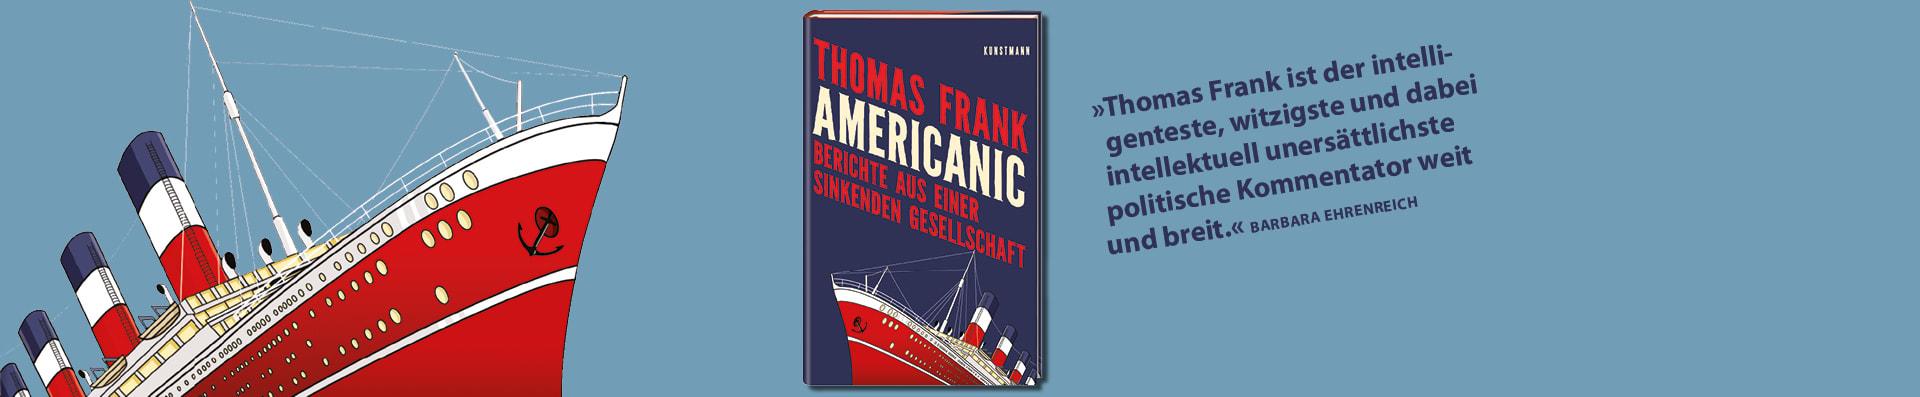 Thomas Frank – Americanic